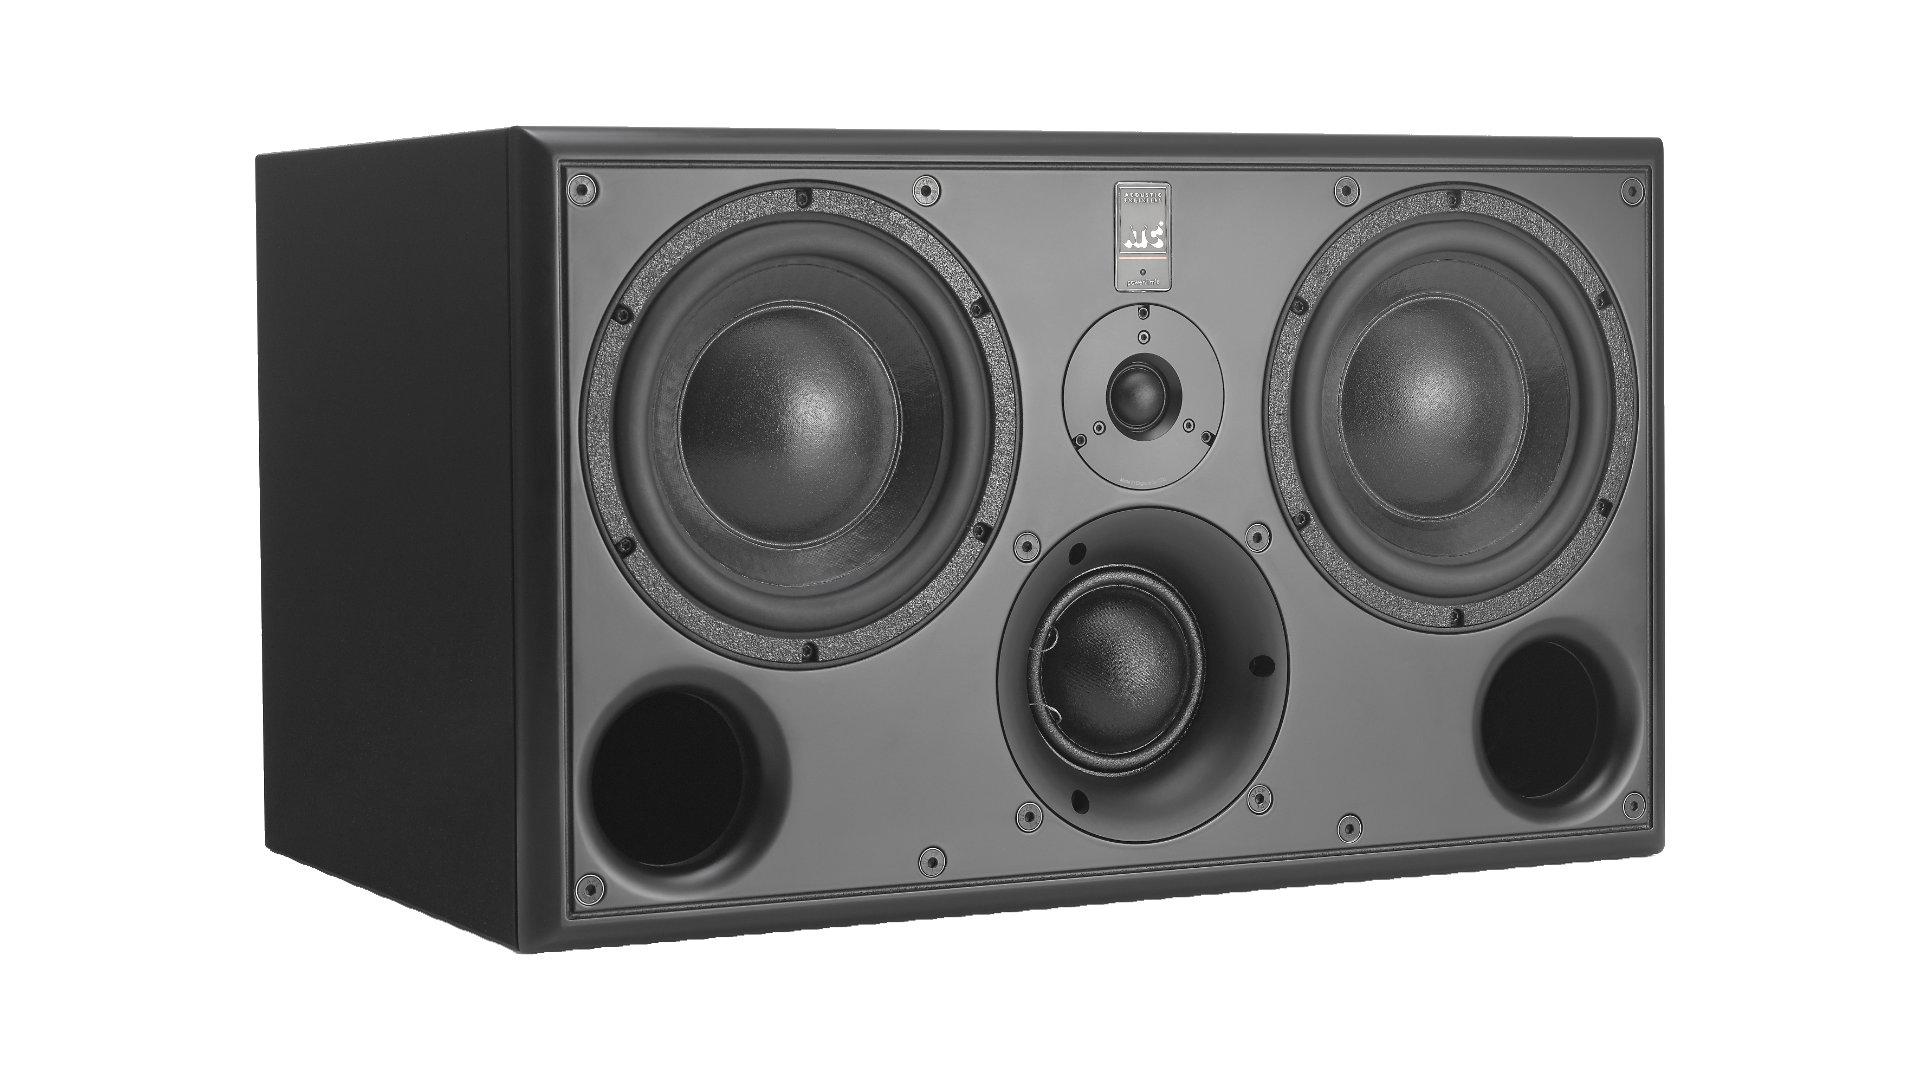 Monitor studyjny bliskiego pola ATC Loudspeakers SCM45A Pro